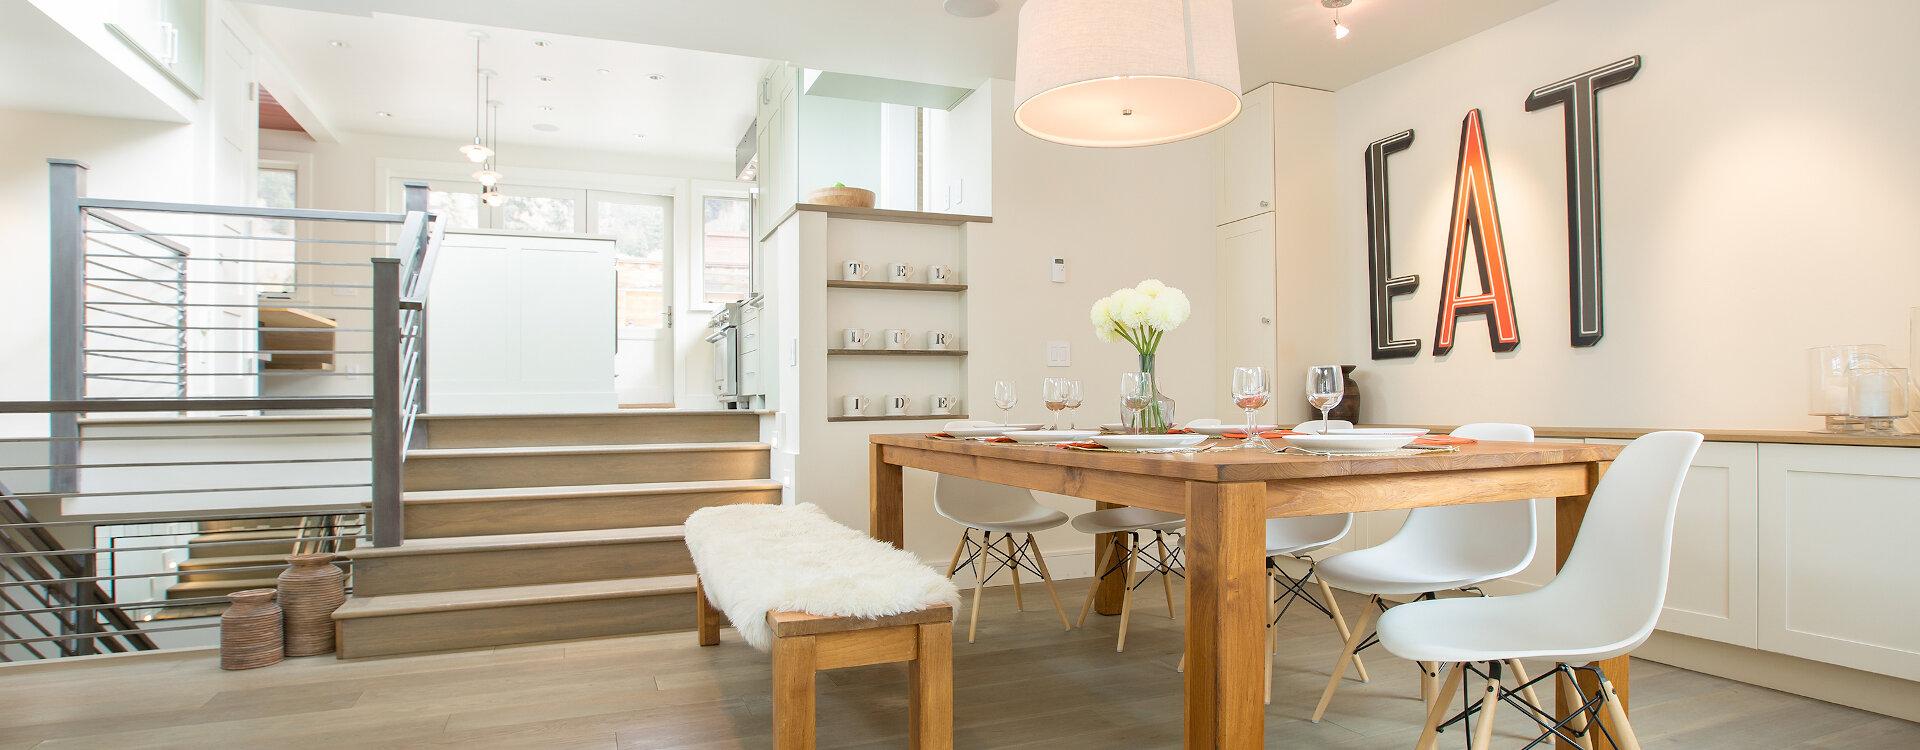 6-Telluride-Meribel-Penthouse-Dining-to-Kitchen-2-web